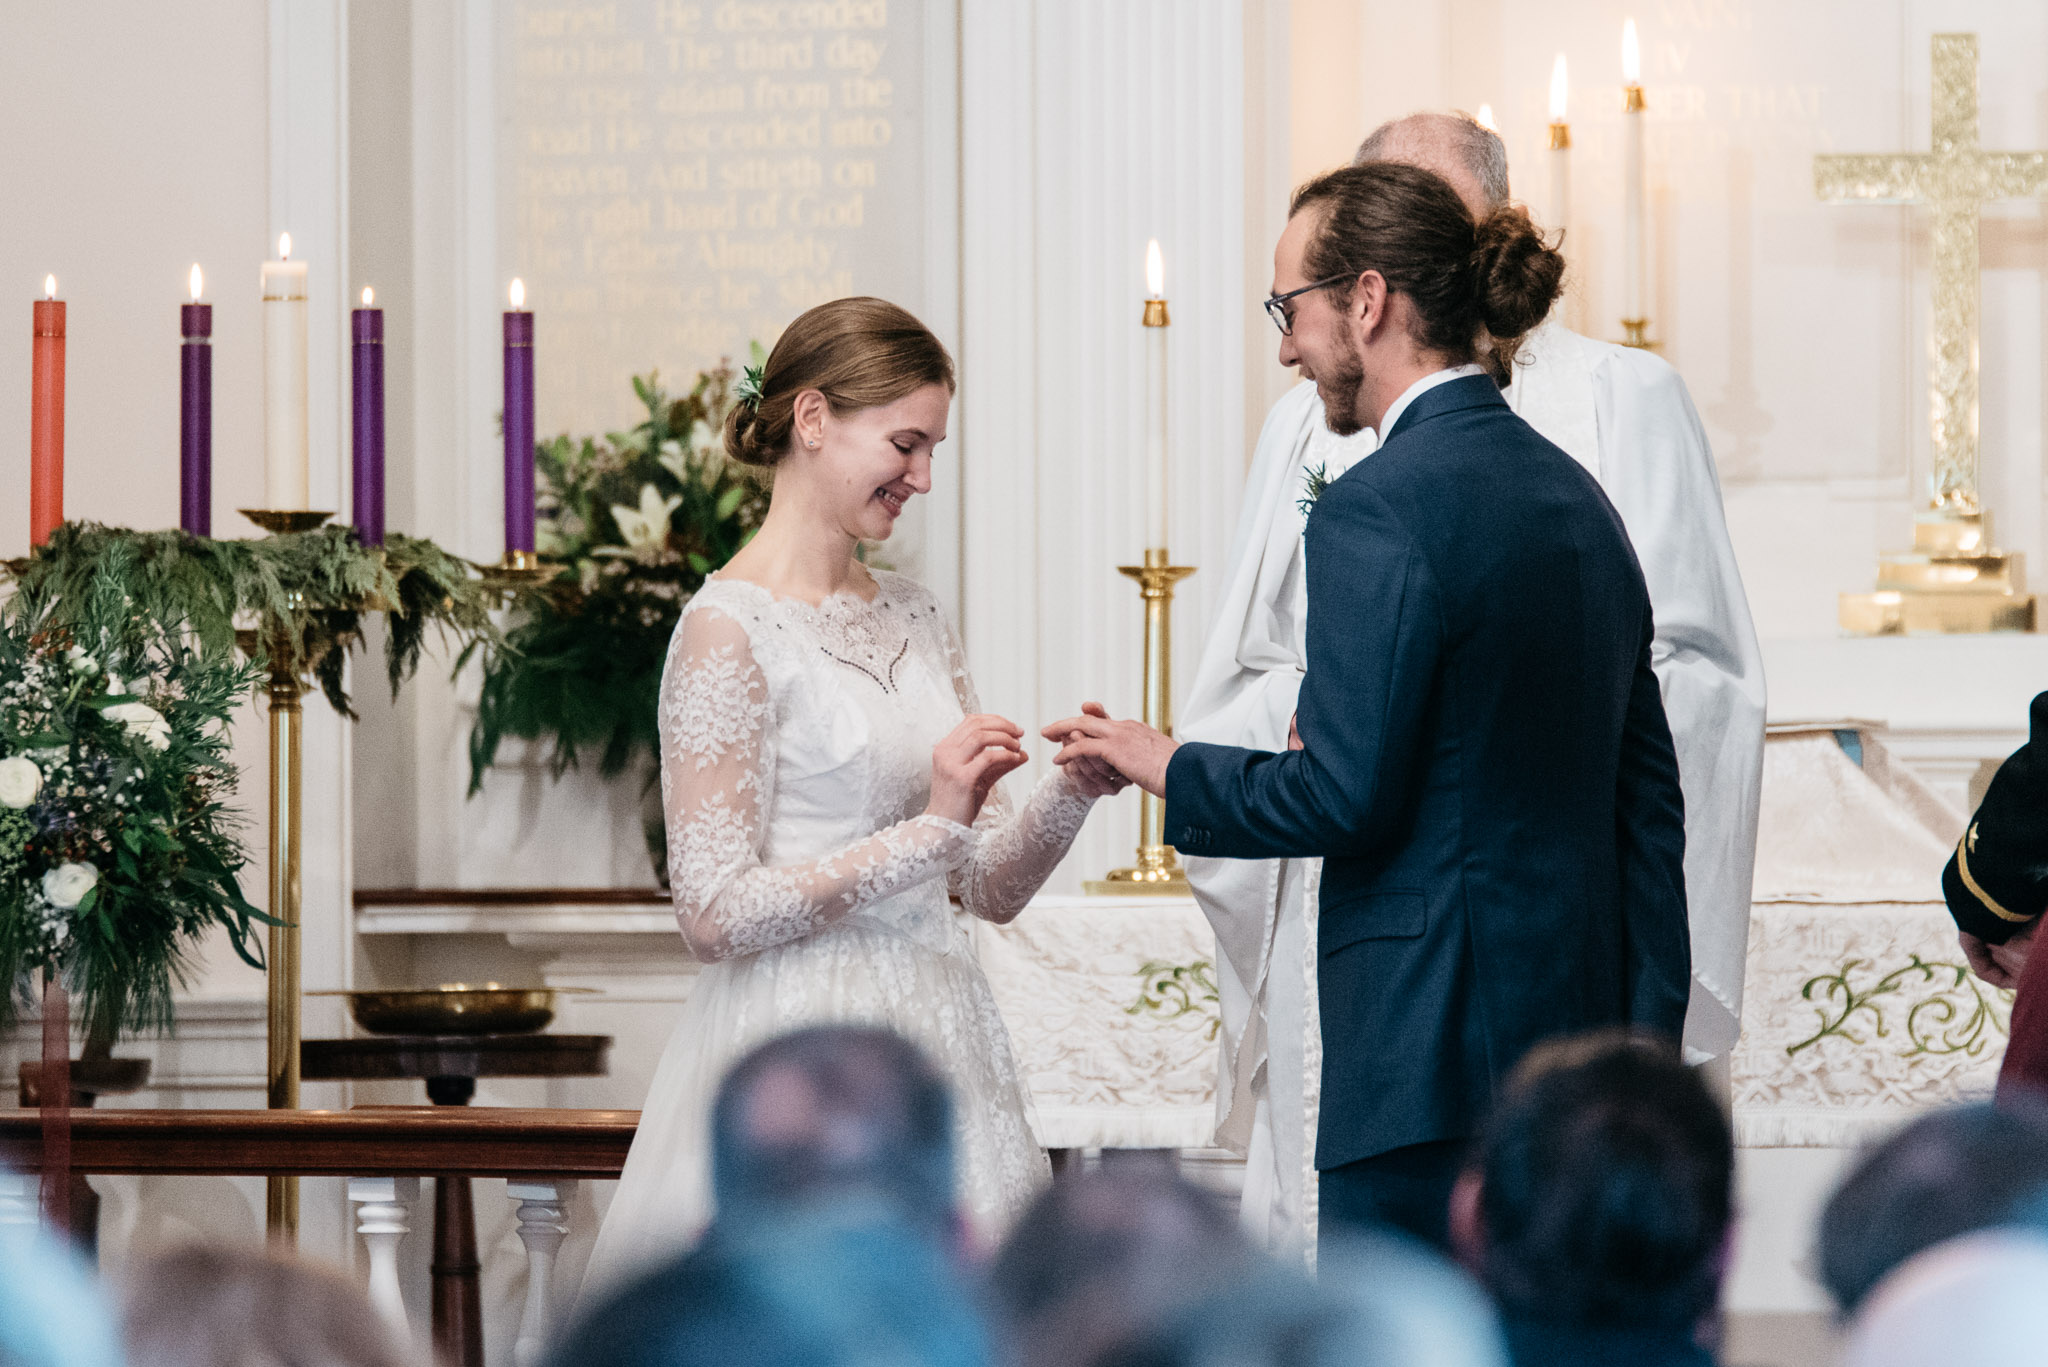 St Michaels Church wedding ceremony, Ligonier Wedding Photographer-8335.jpg